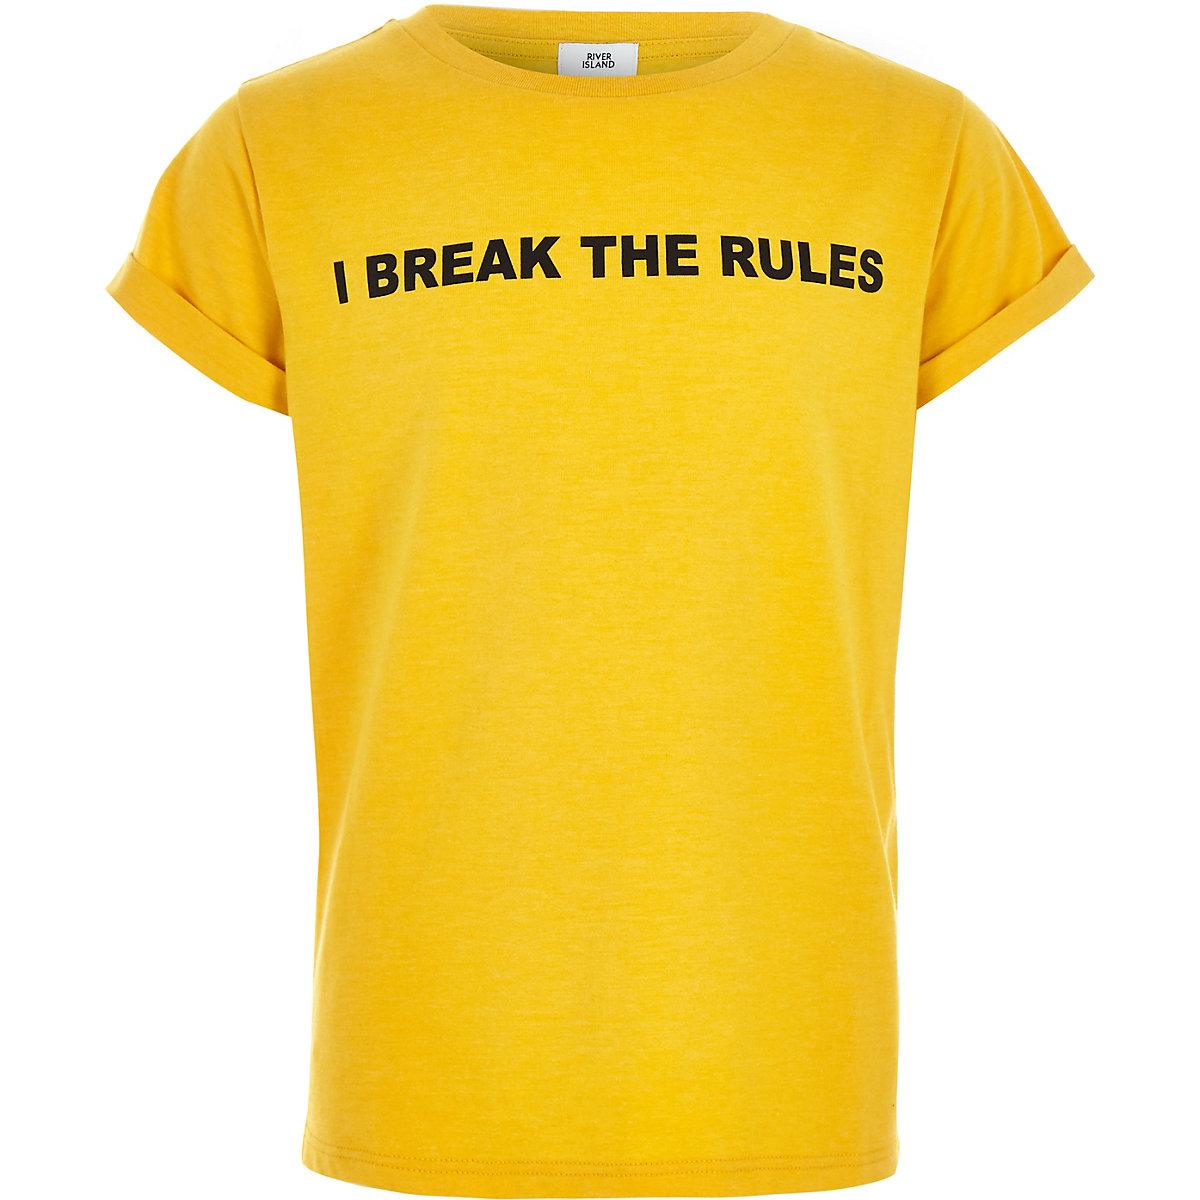 Girls yellow 'I break the rules' T-shirt